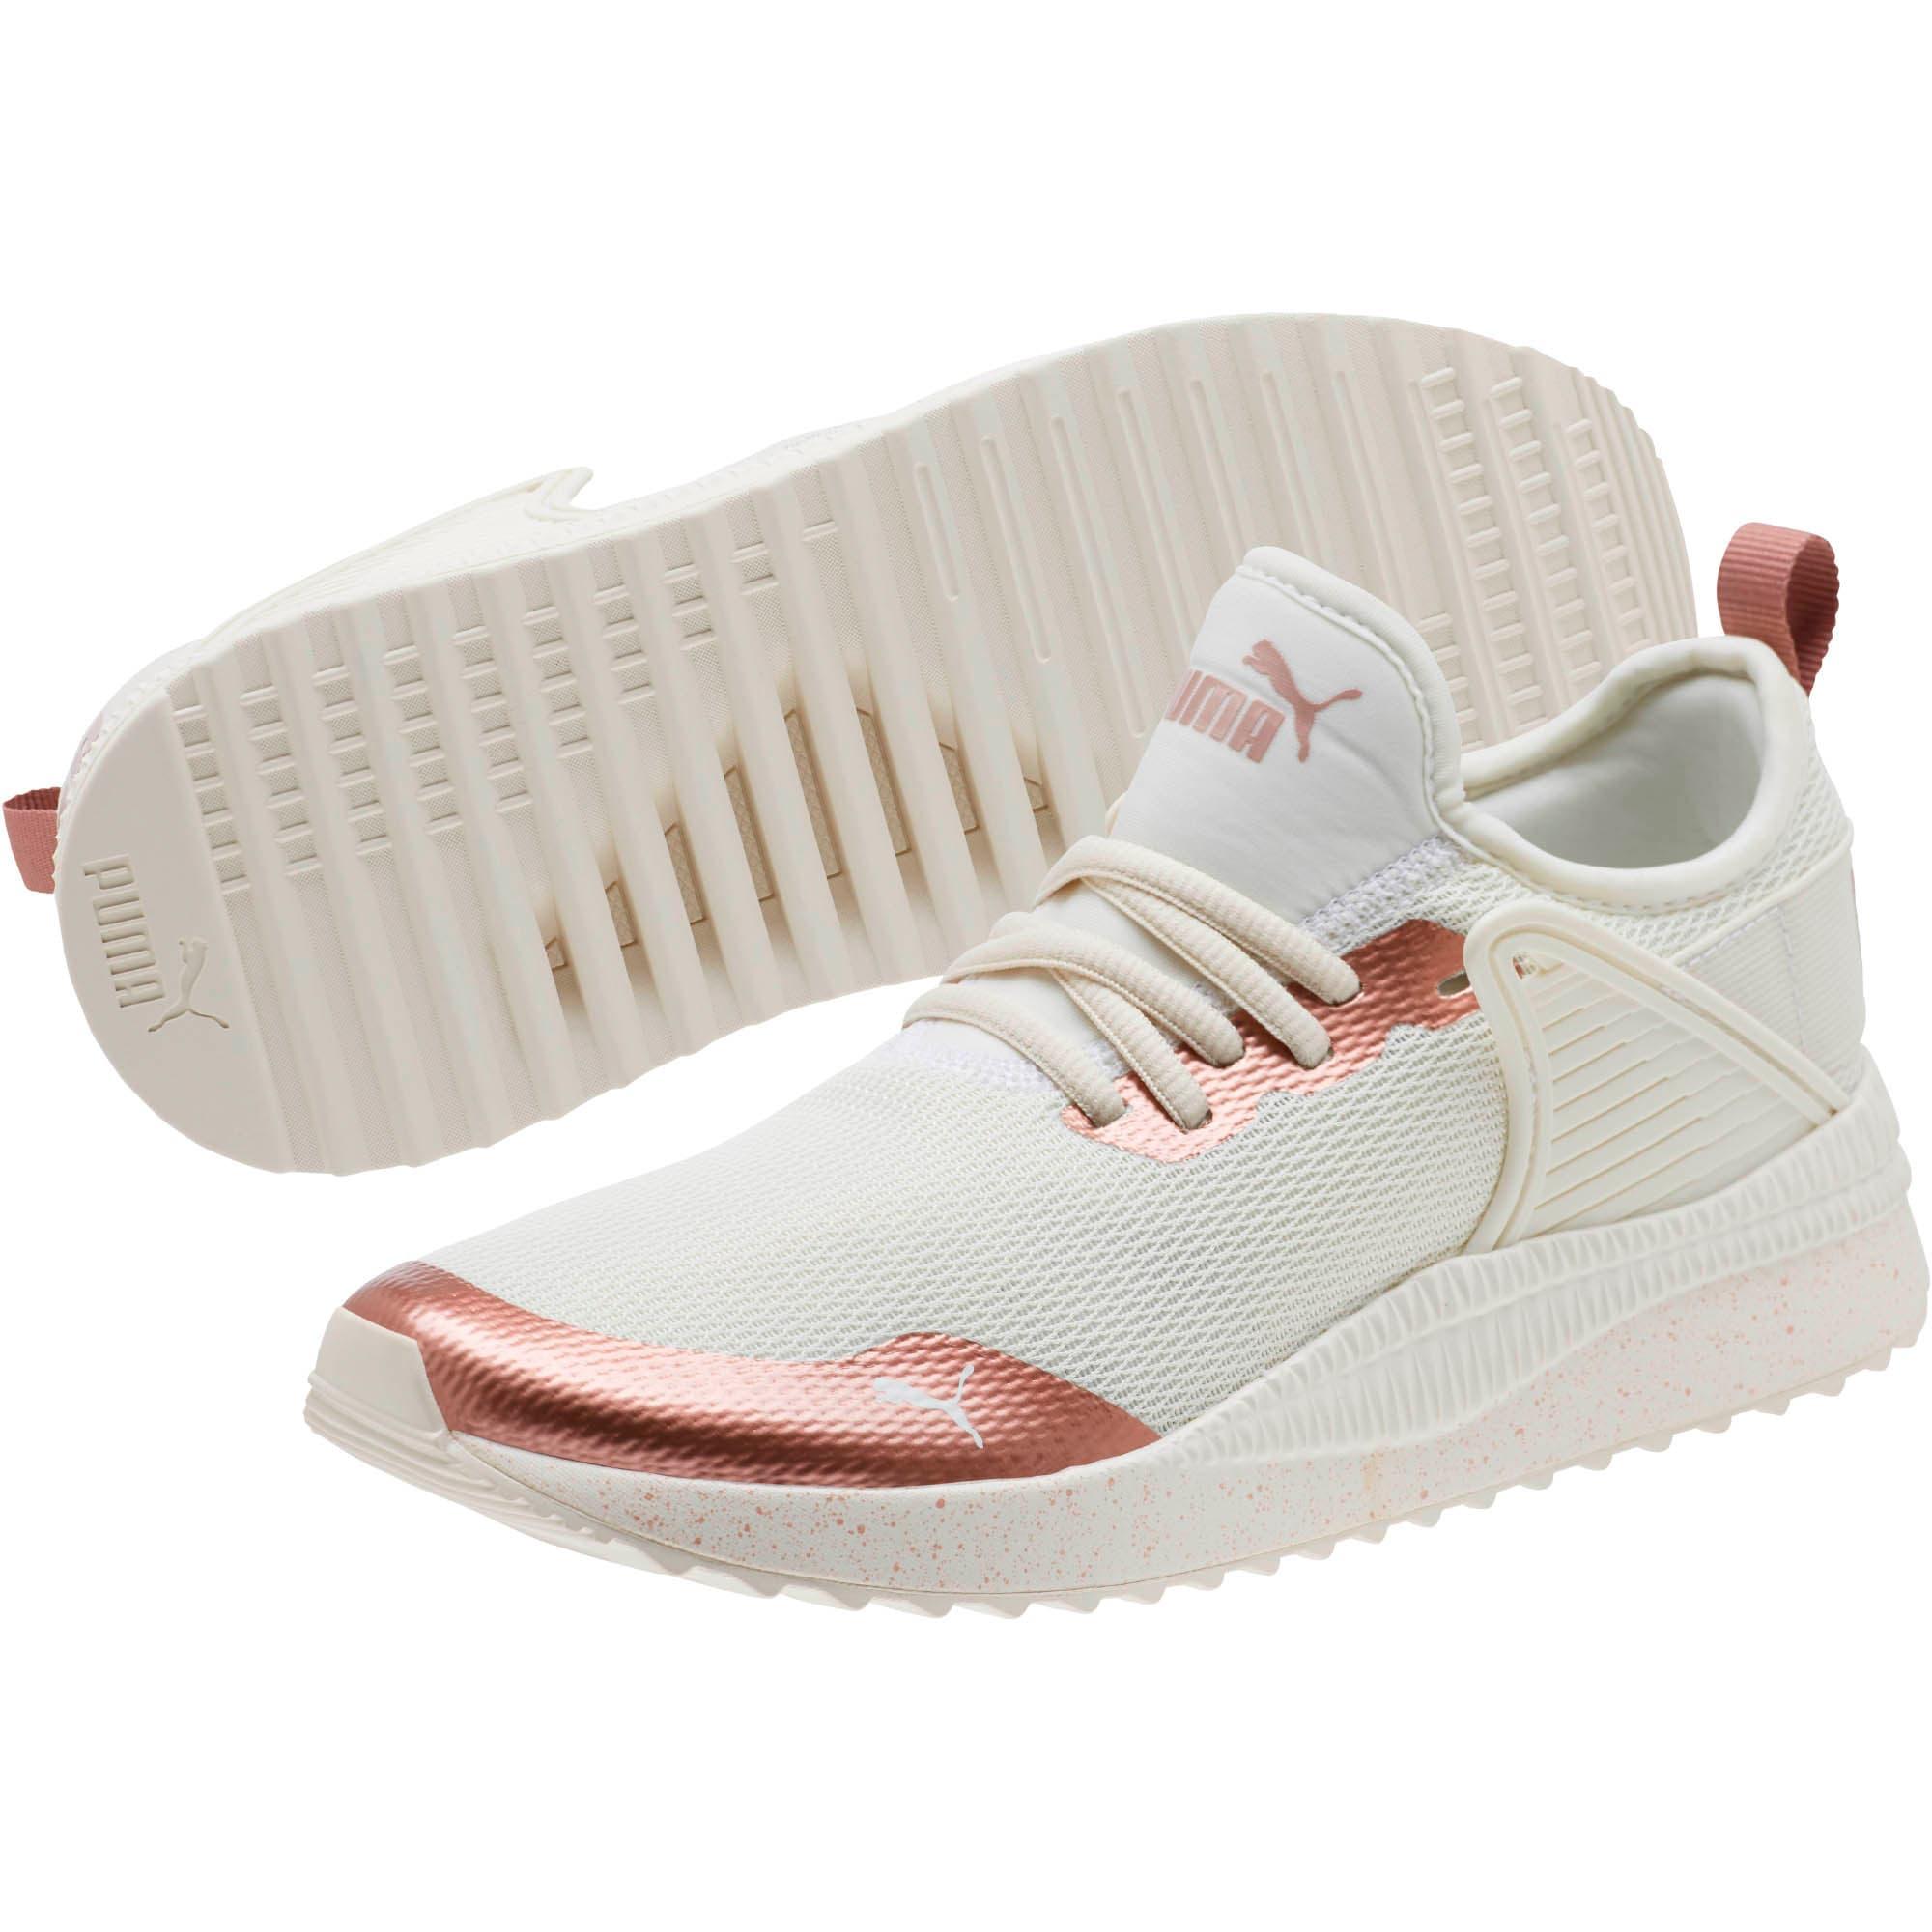 Thumbnail 2 of Pacer Nex tCage Metallic Speckle Women's Sneakers, Whisper White-Rose Gold, medium